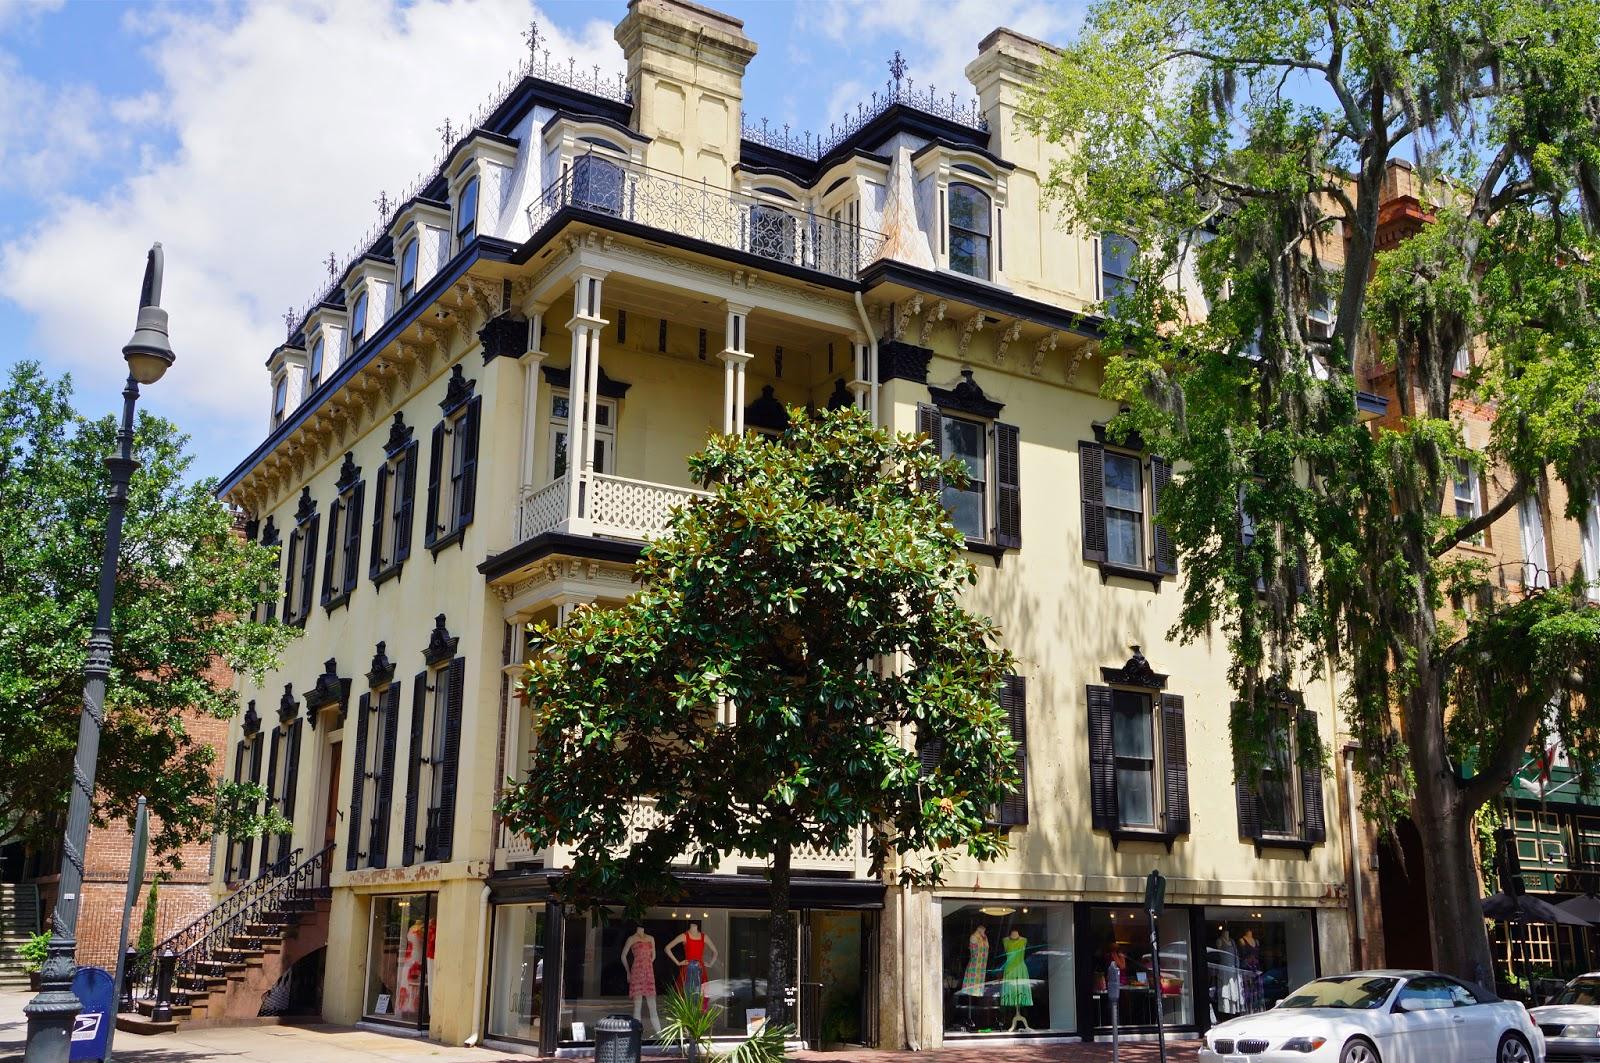 Savannah georgia lee reid family travels photo blog for Historic houses in savannah ga